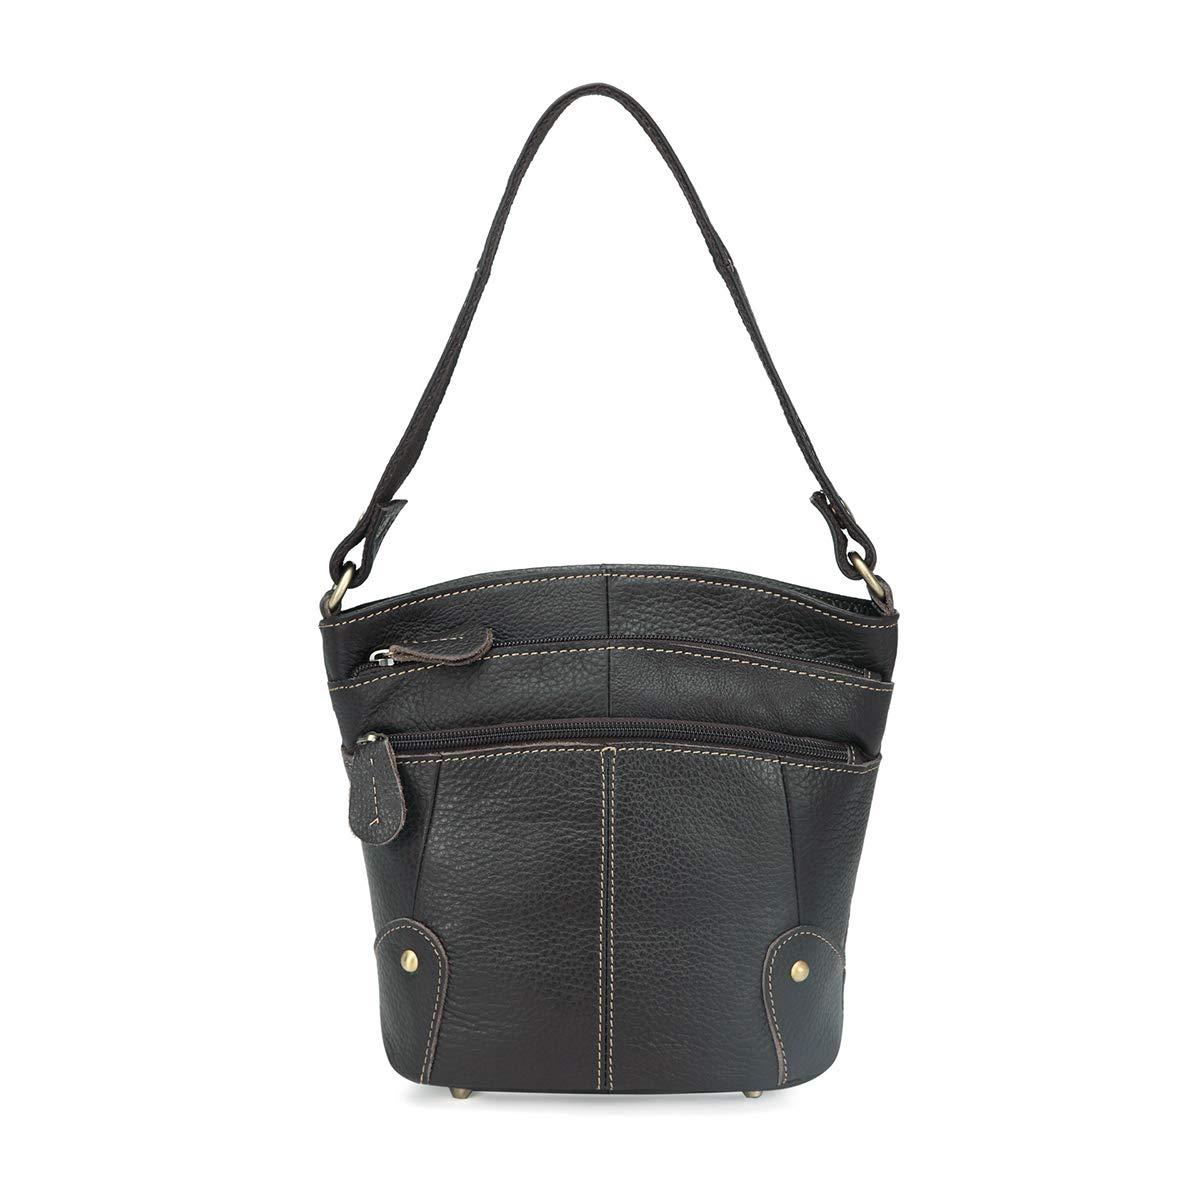 Crossbody Bag for Women Leather Top Handle Tote Purses Ladies Satchels Handbag (Coffee)